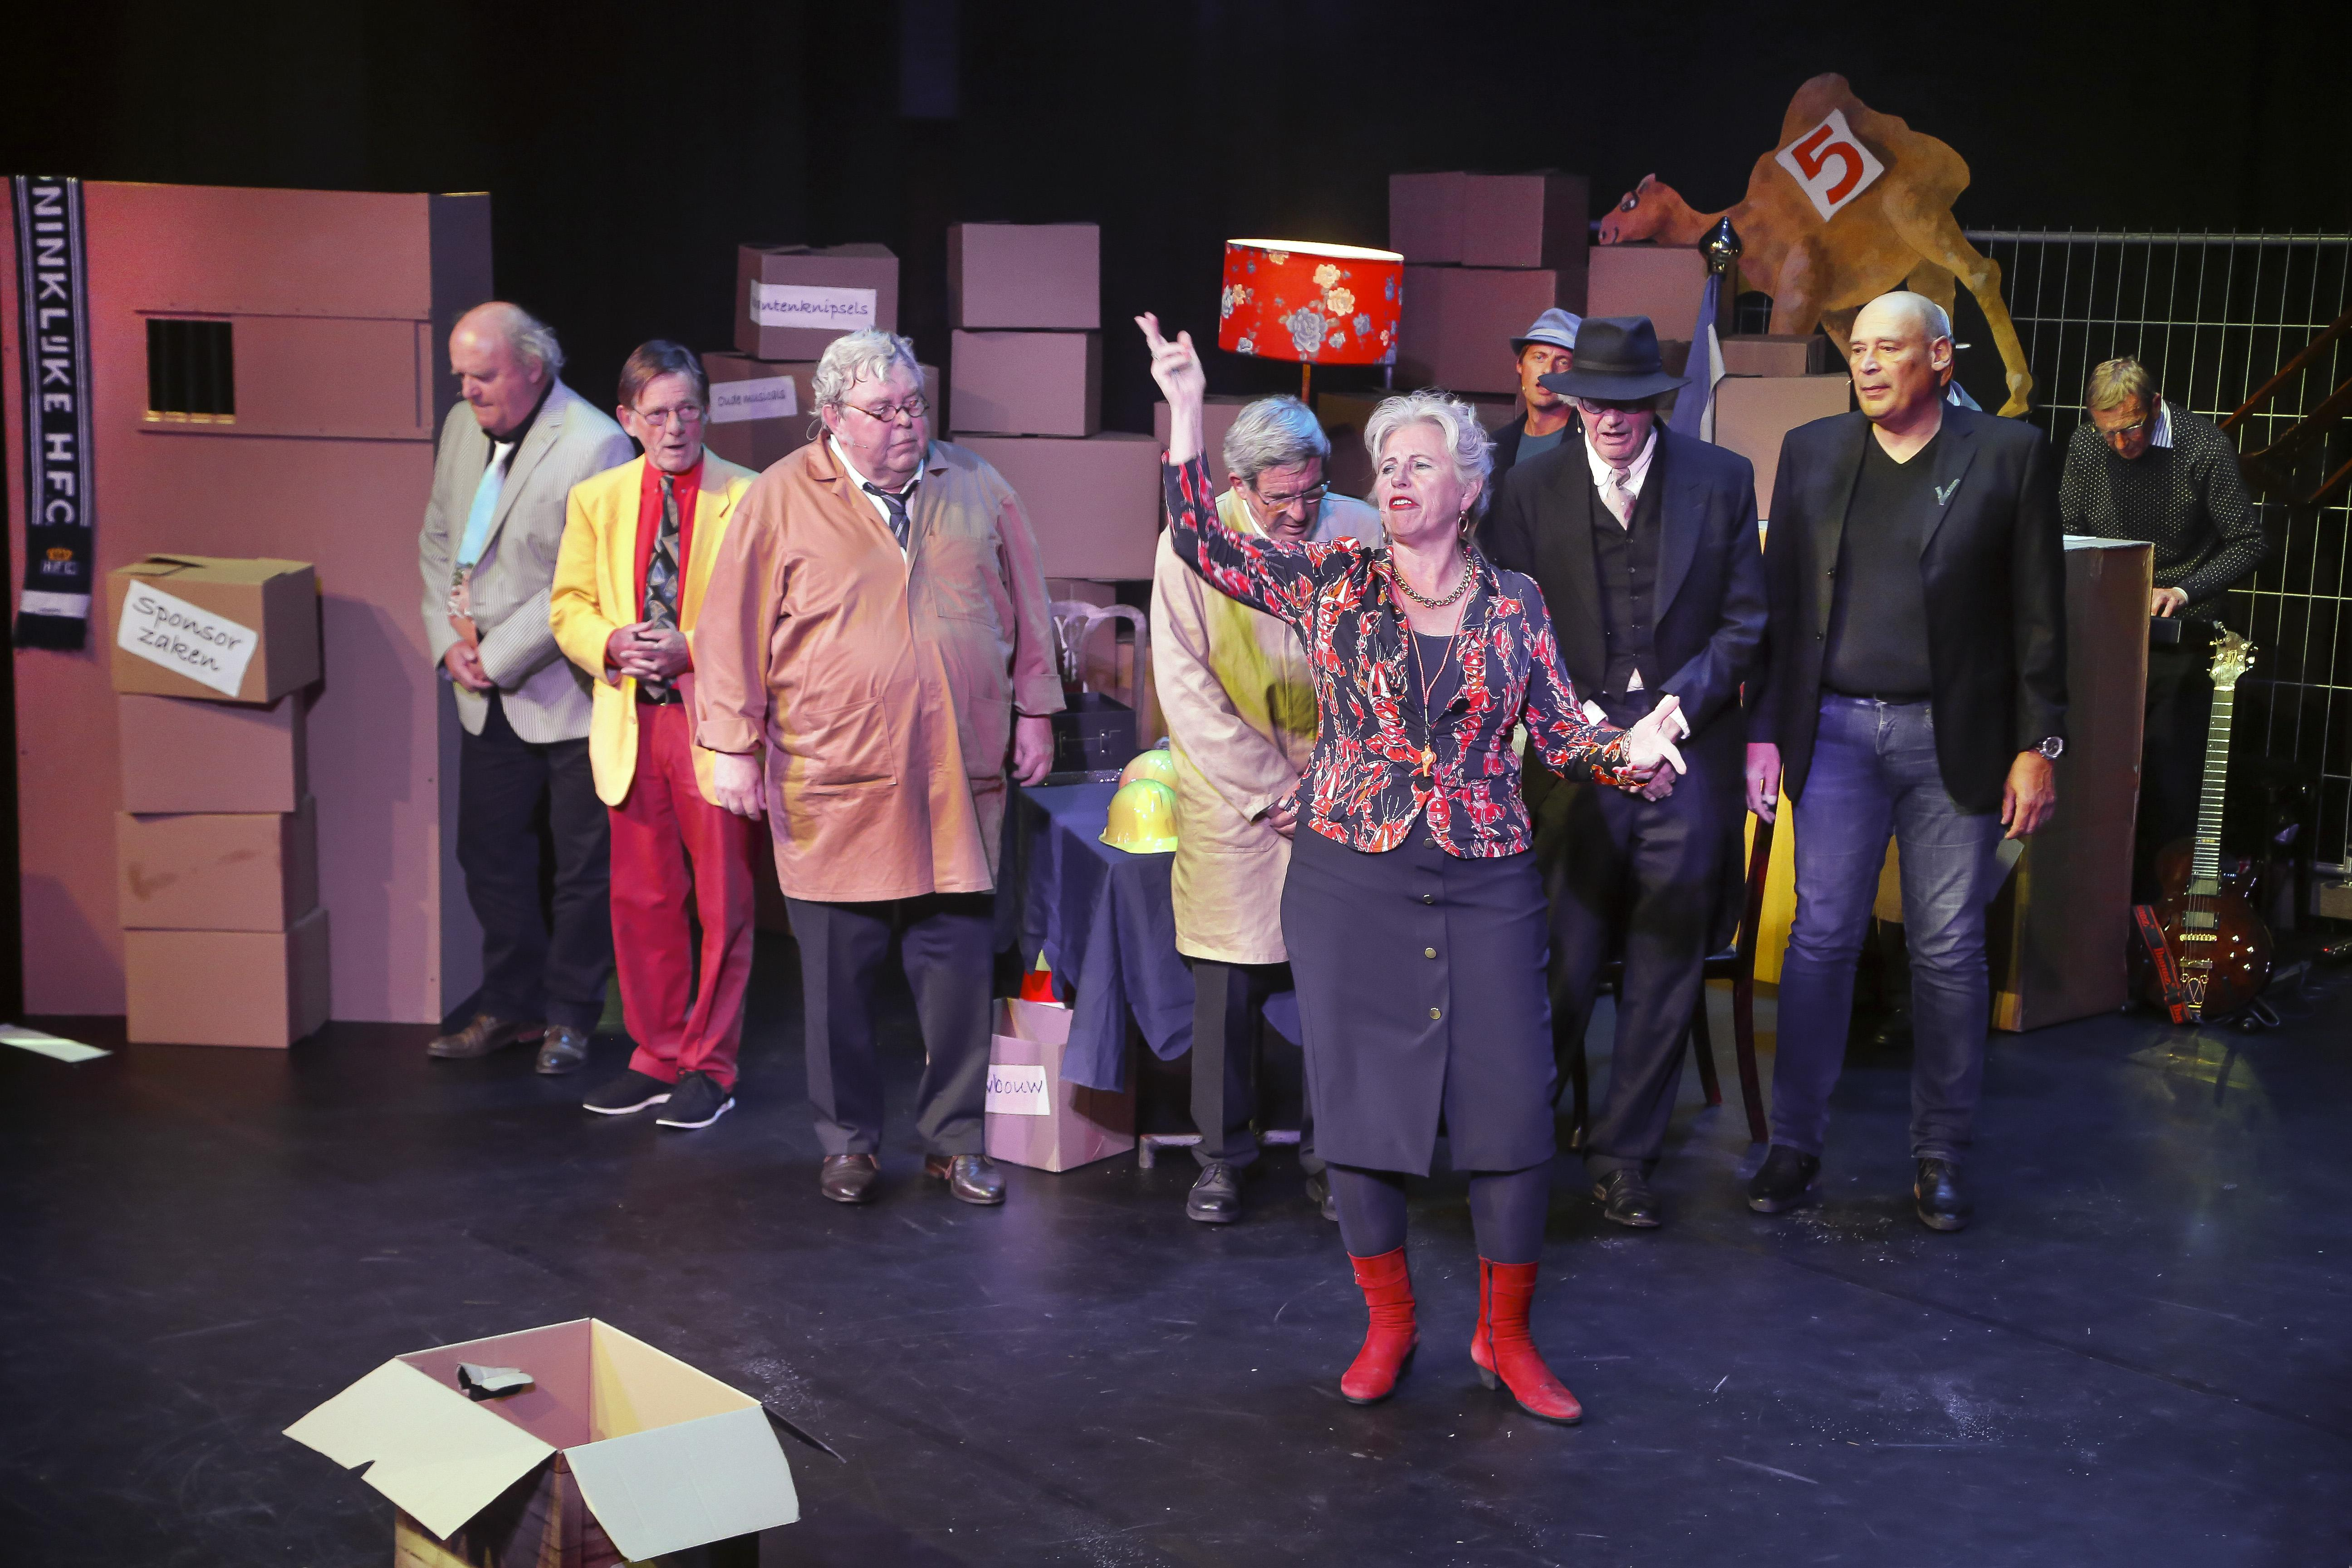 De zevende HFC-musical: Goud van Oud in Haarlemmerhout Theater